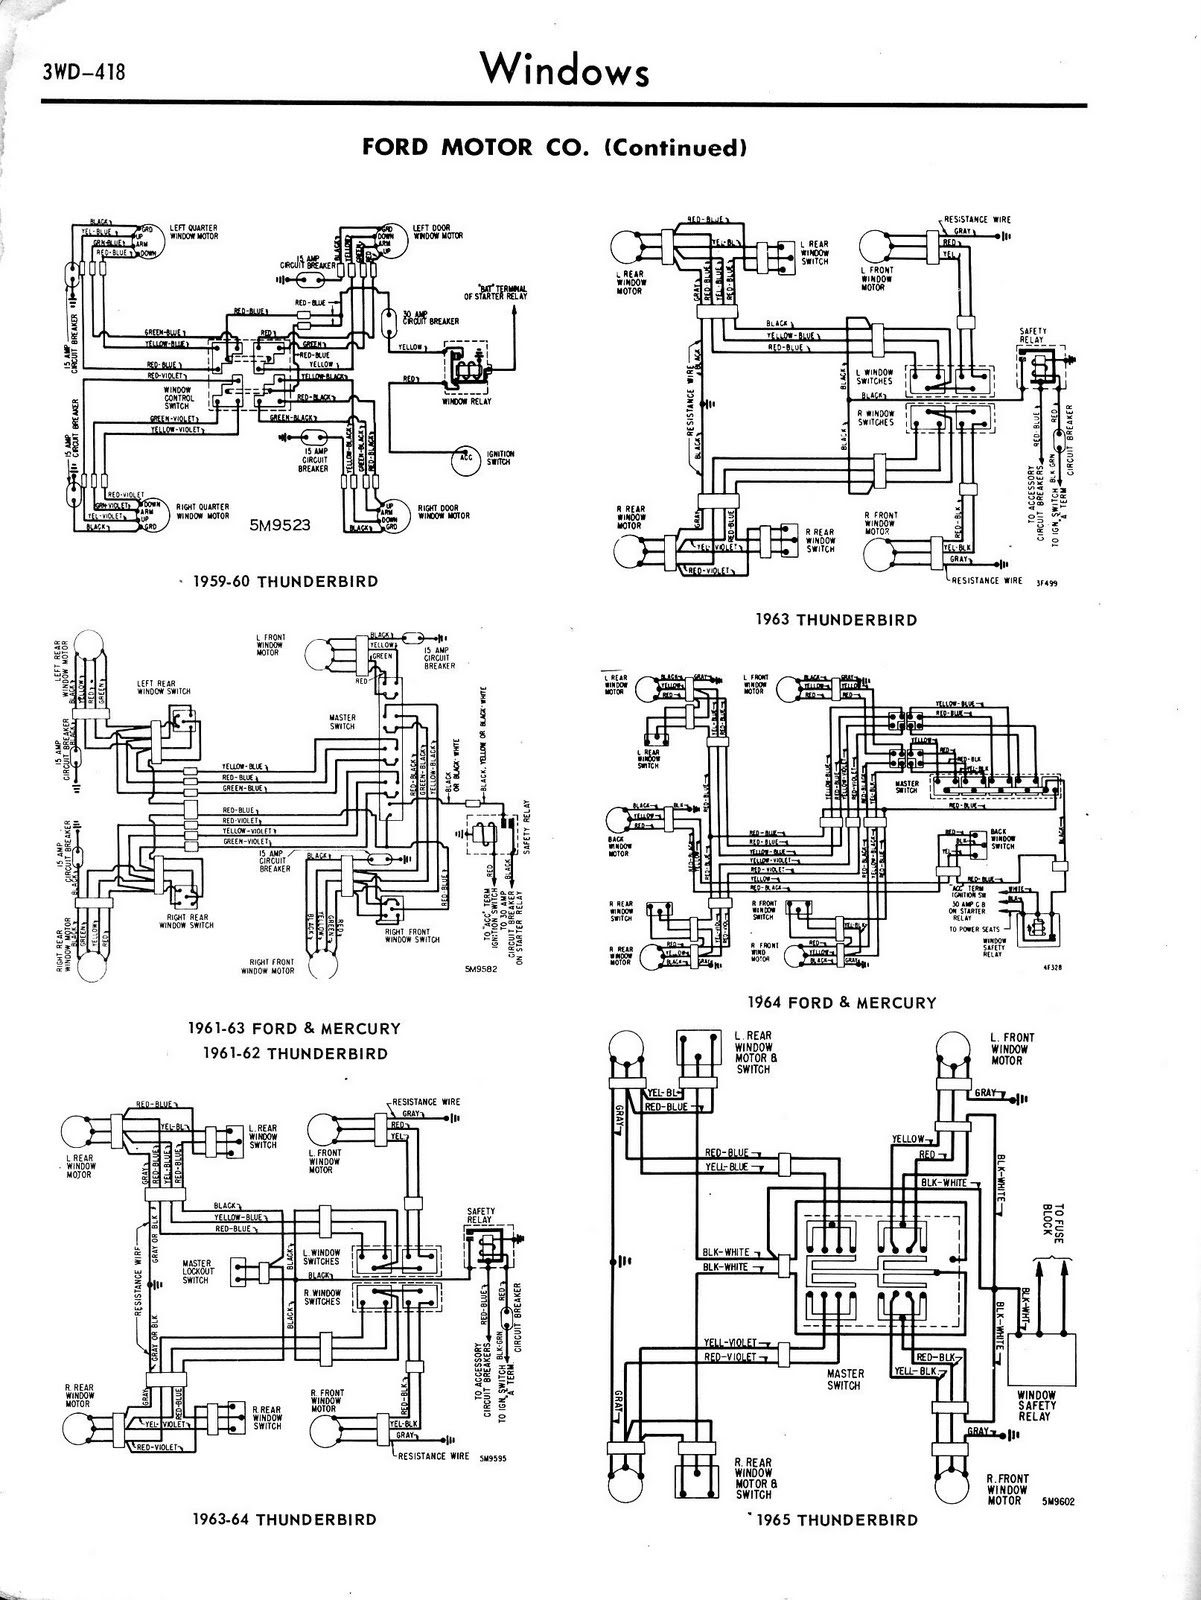 1957 Thunderbird Power Window Wiring Diagram Ford 2002 1988 Turbo Coupe Diagram88 Fuse Box Data Today